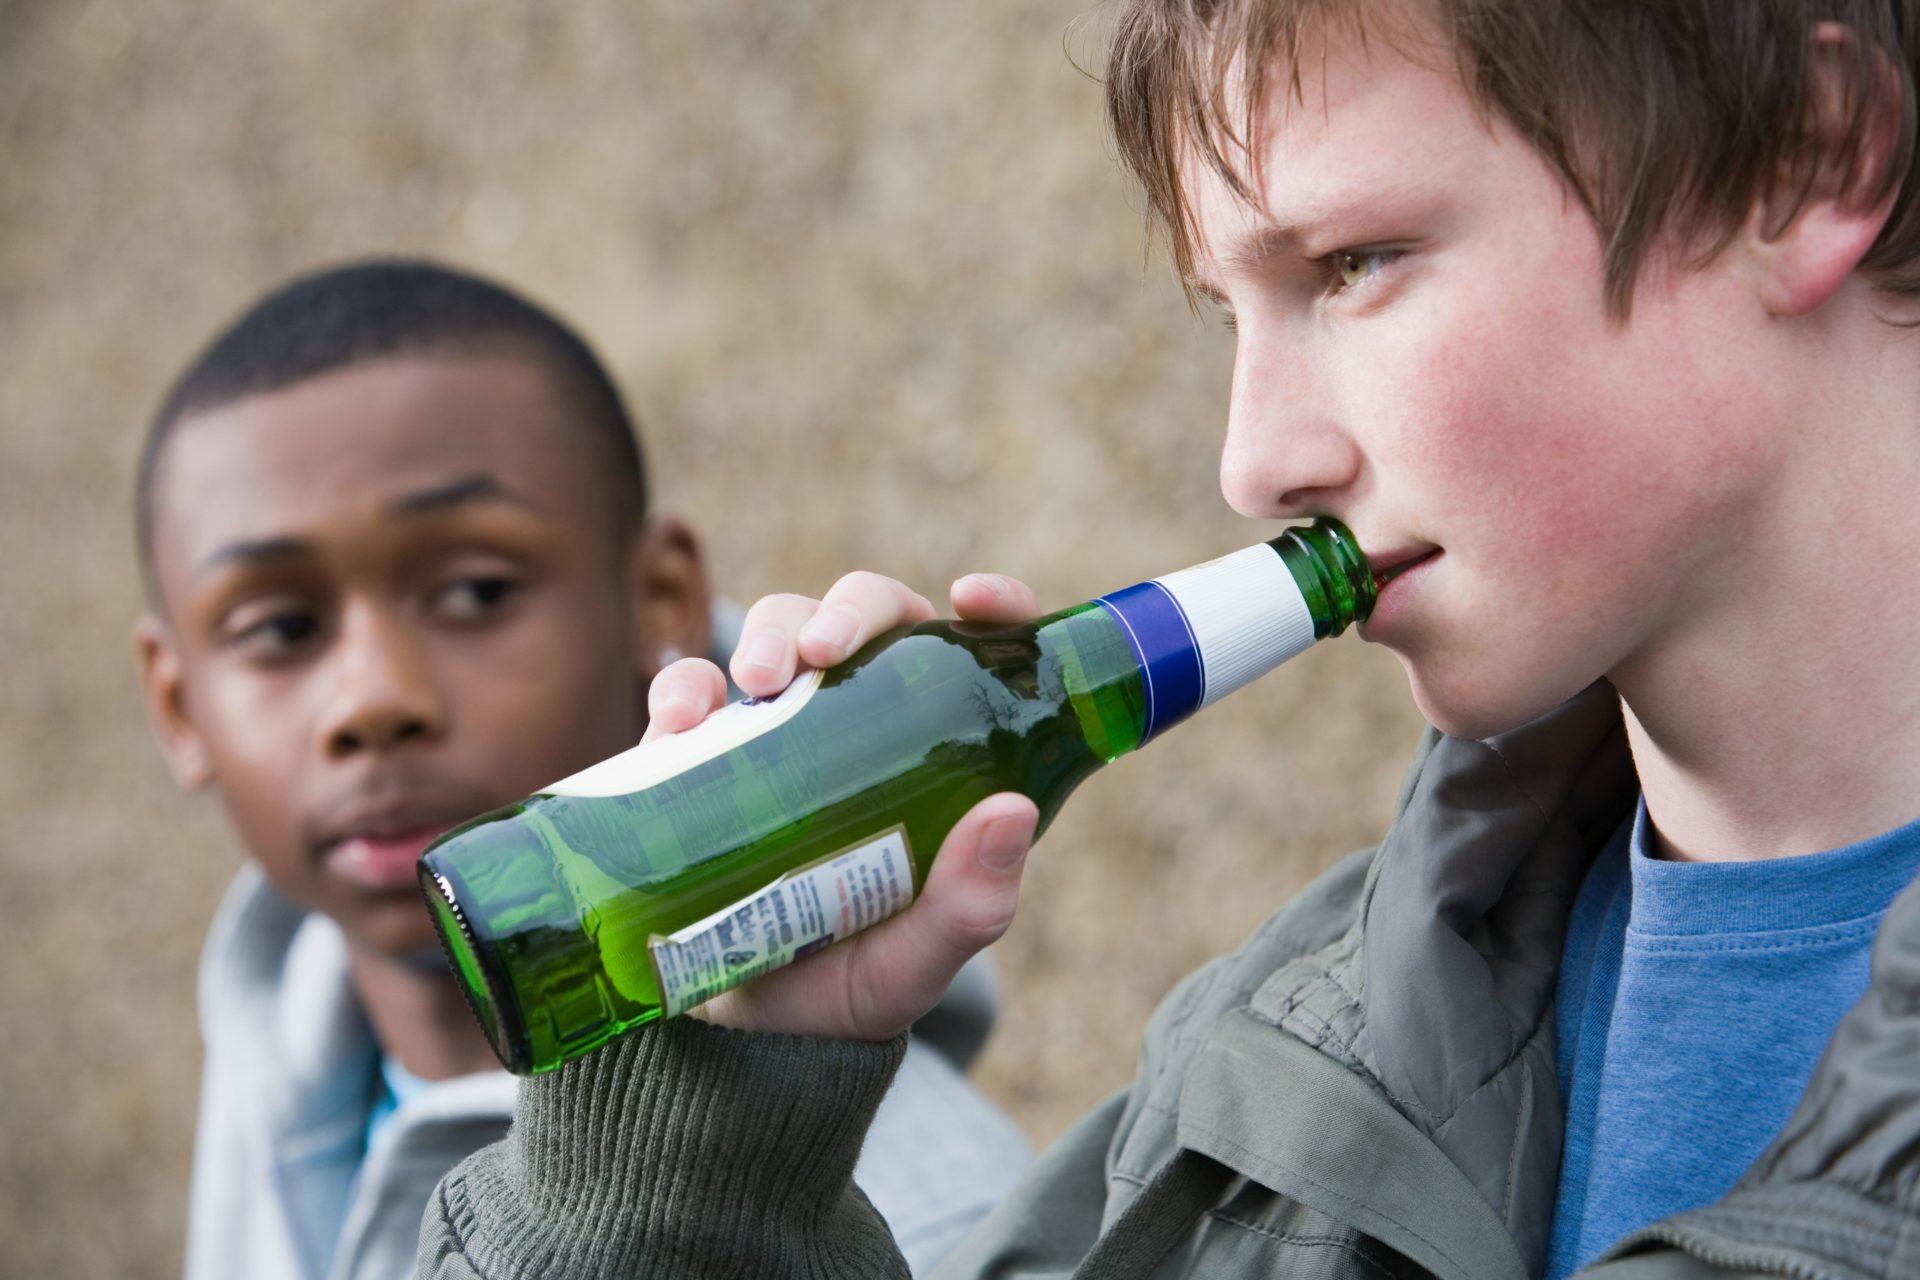 Minor Alcohol